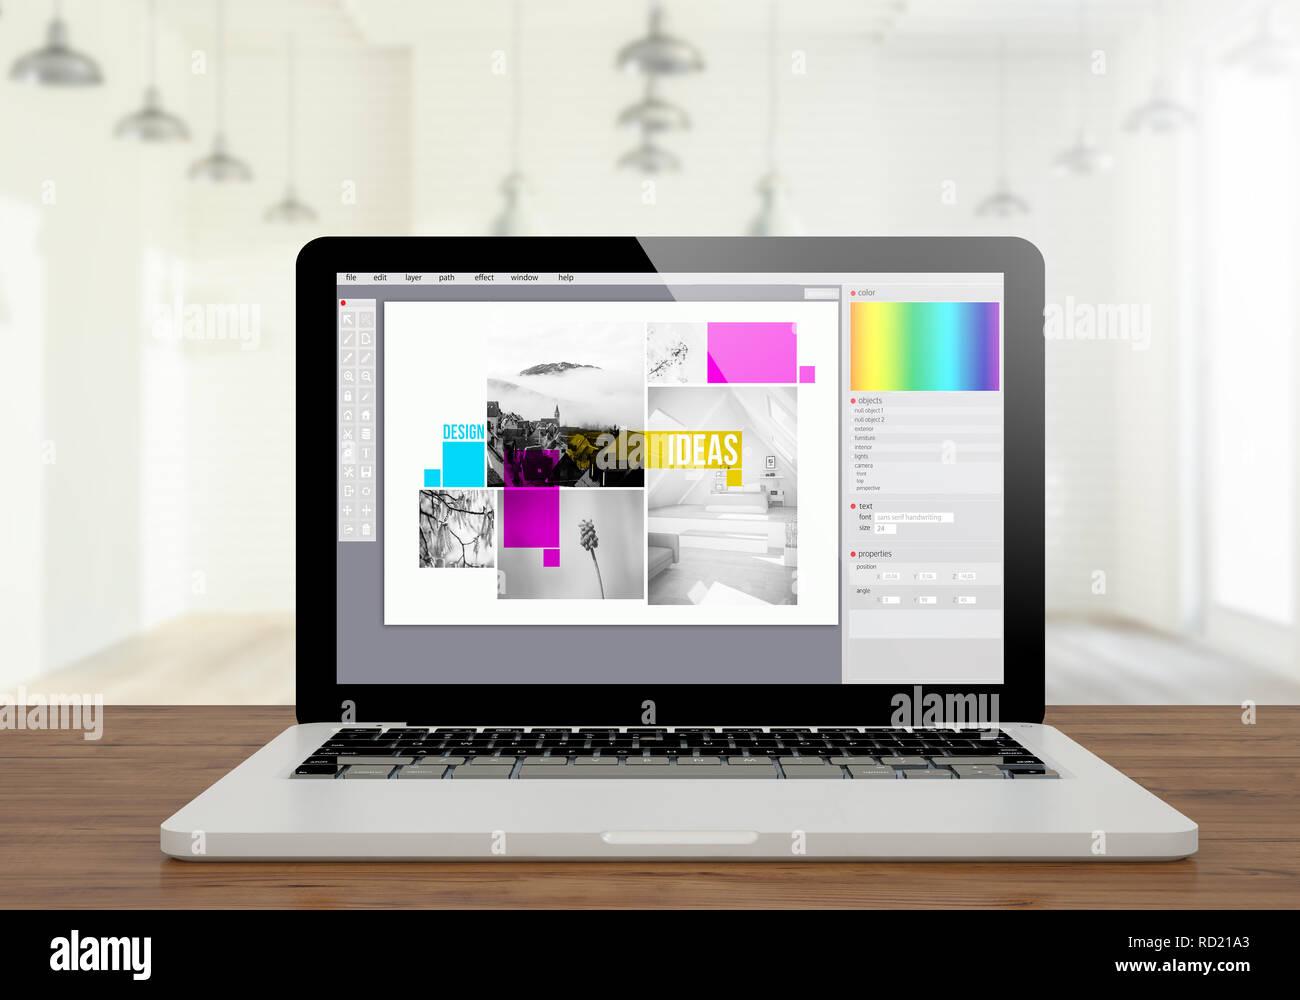 3d Rendering Of Graphic Design Software Screen Laptop On Desktop Stock Photo Alamy